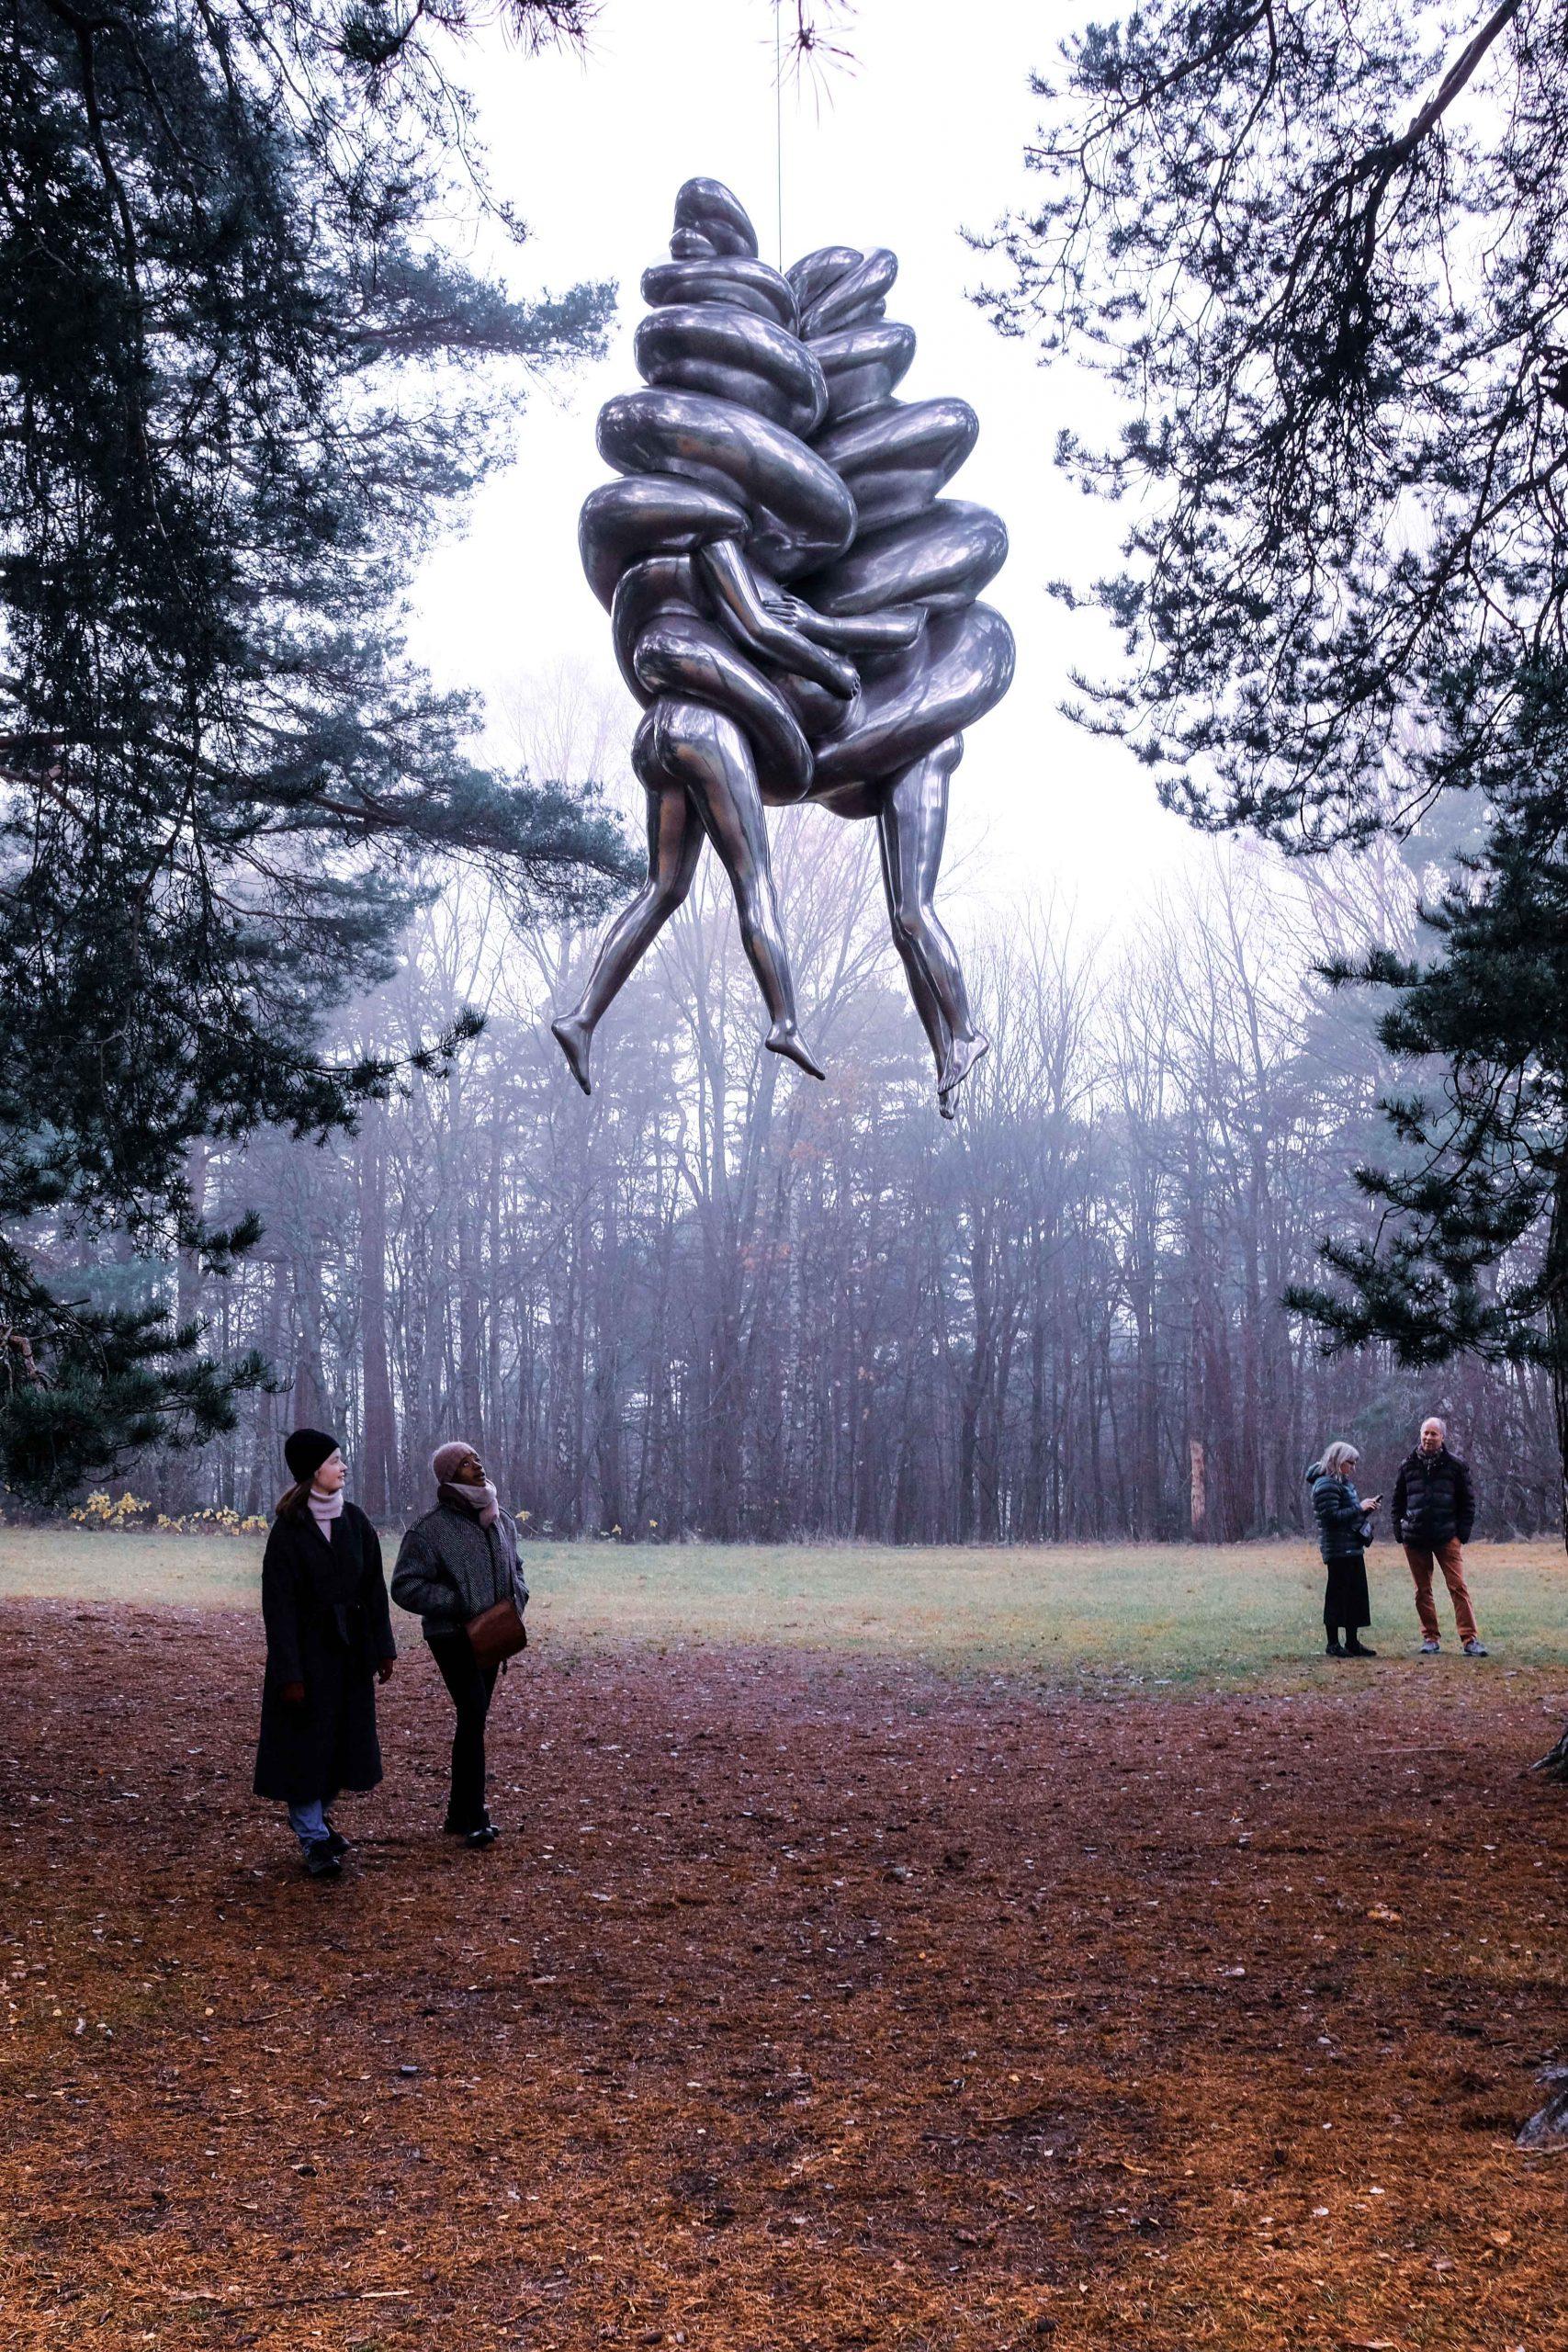 Ekebergparken Sculpture Park | Nicholas Ball